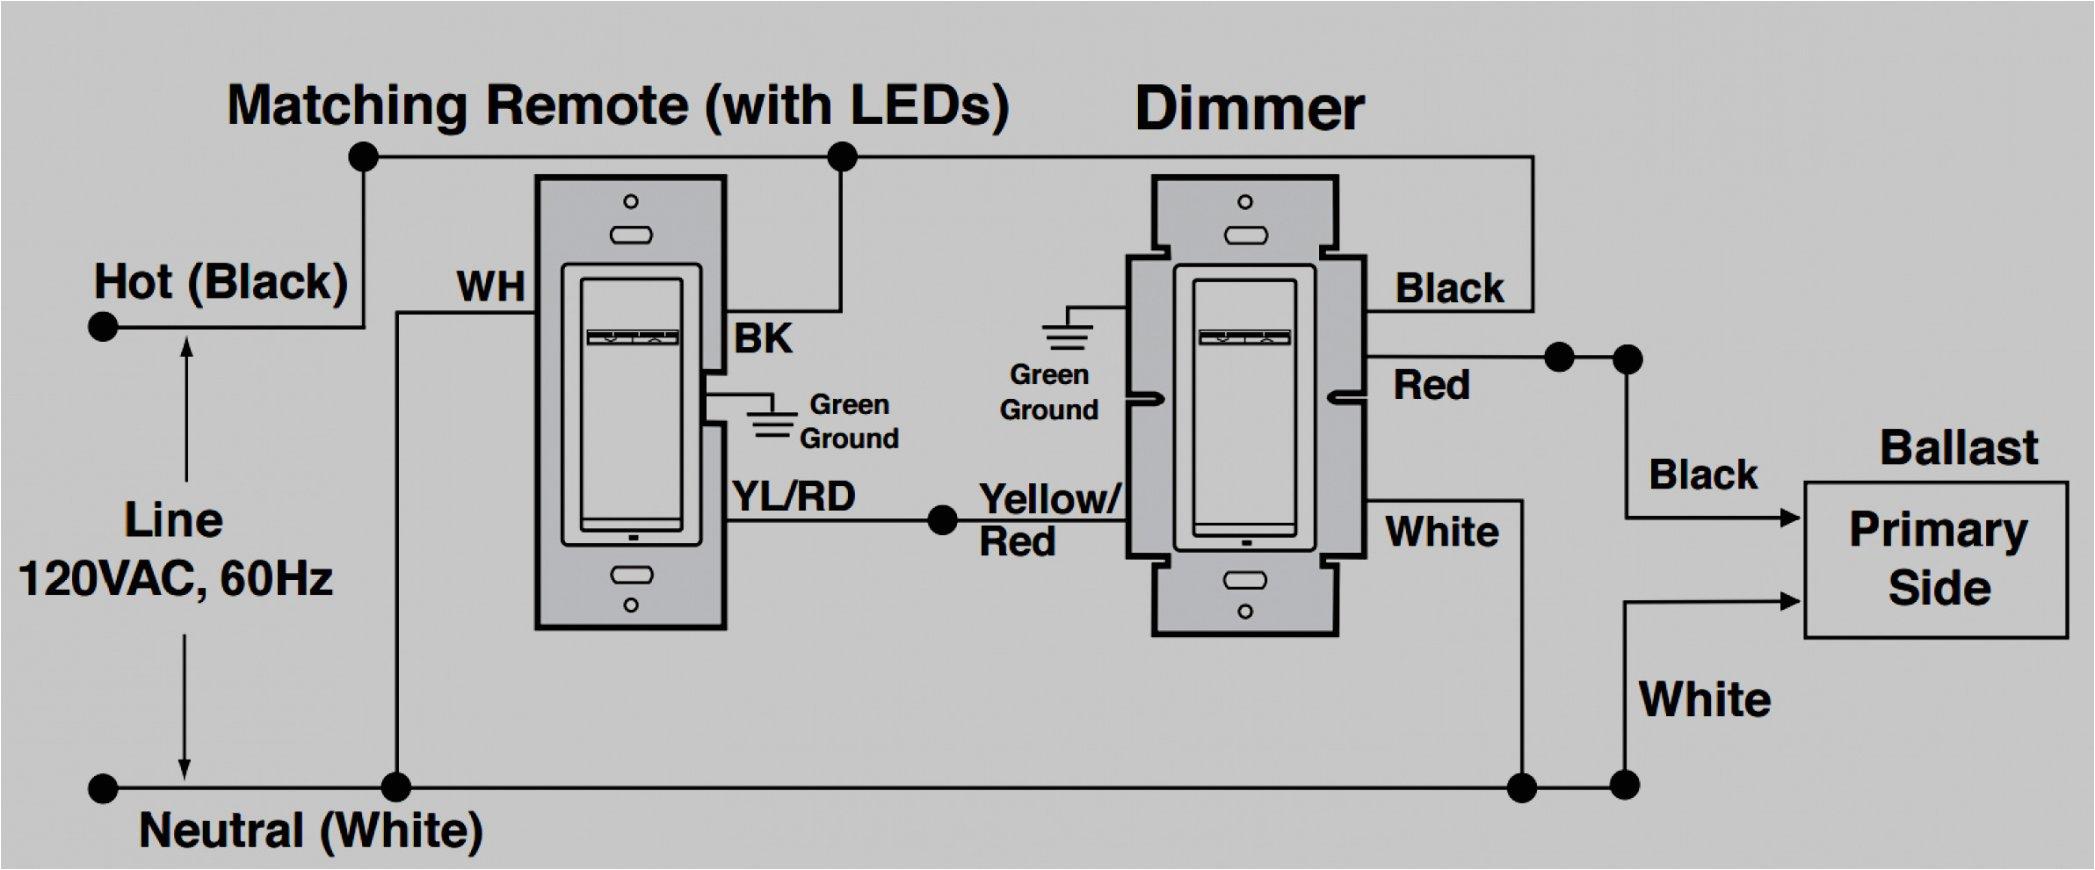 3 way switch wiring diagram variation wiring diagram creativity wiring diagram